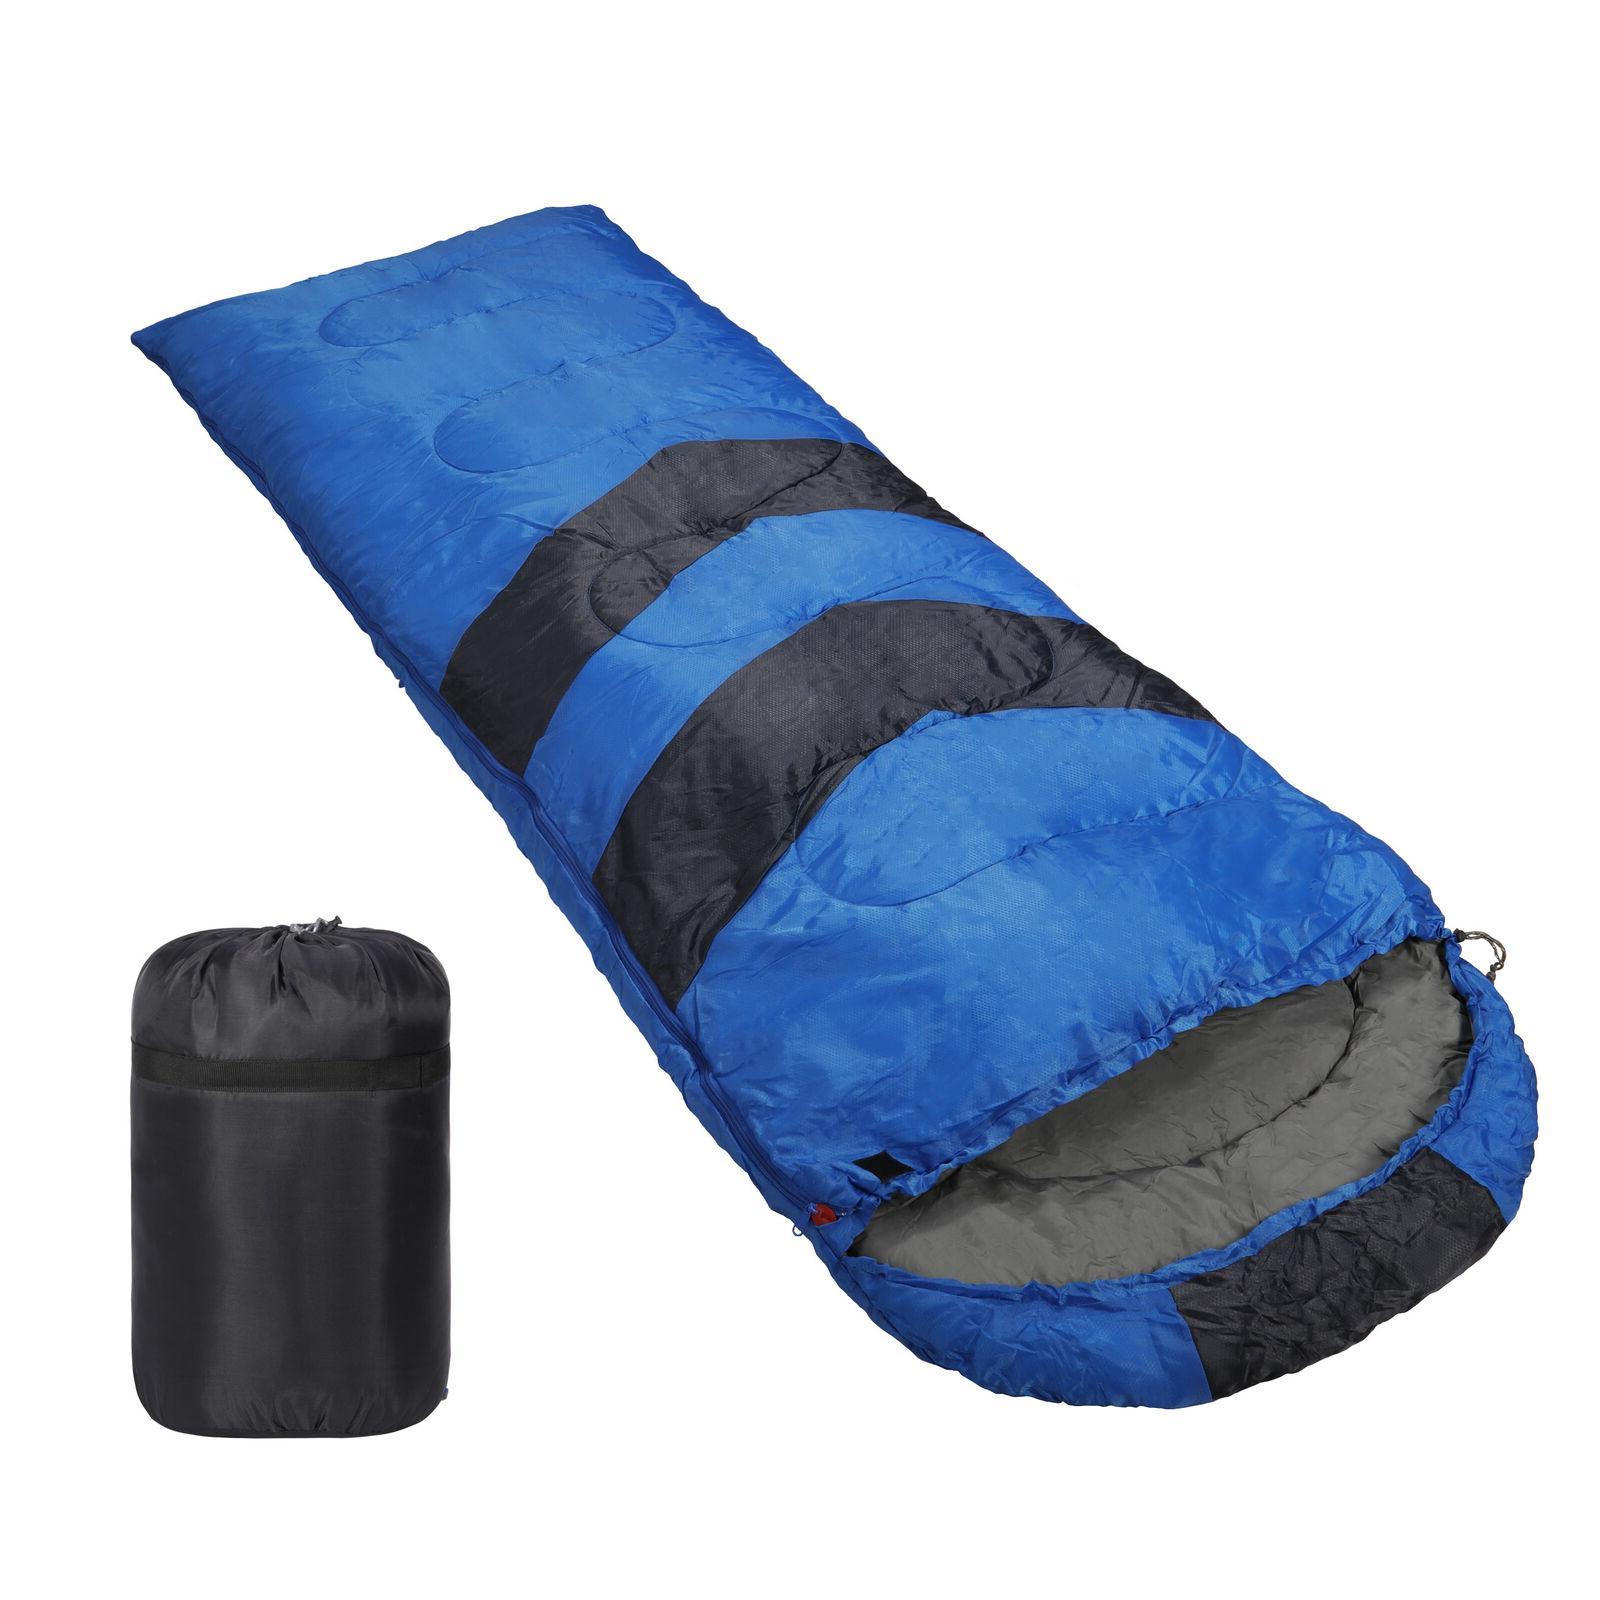 Outdoor Waterproof Sleeping Backpacking Adults Warm Camping Hiking